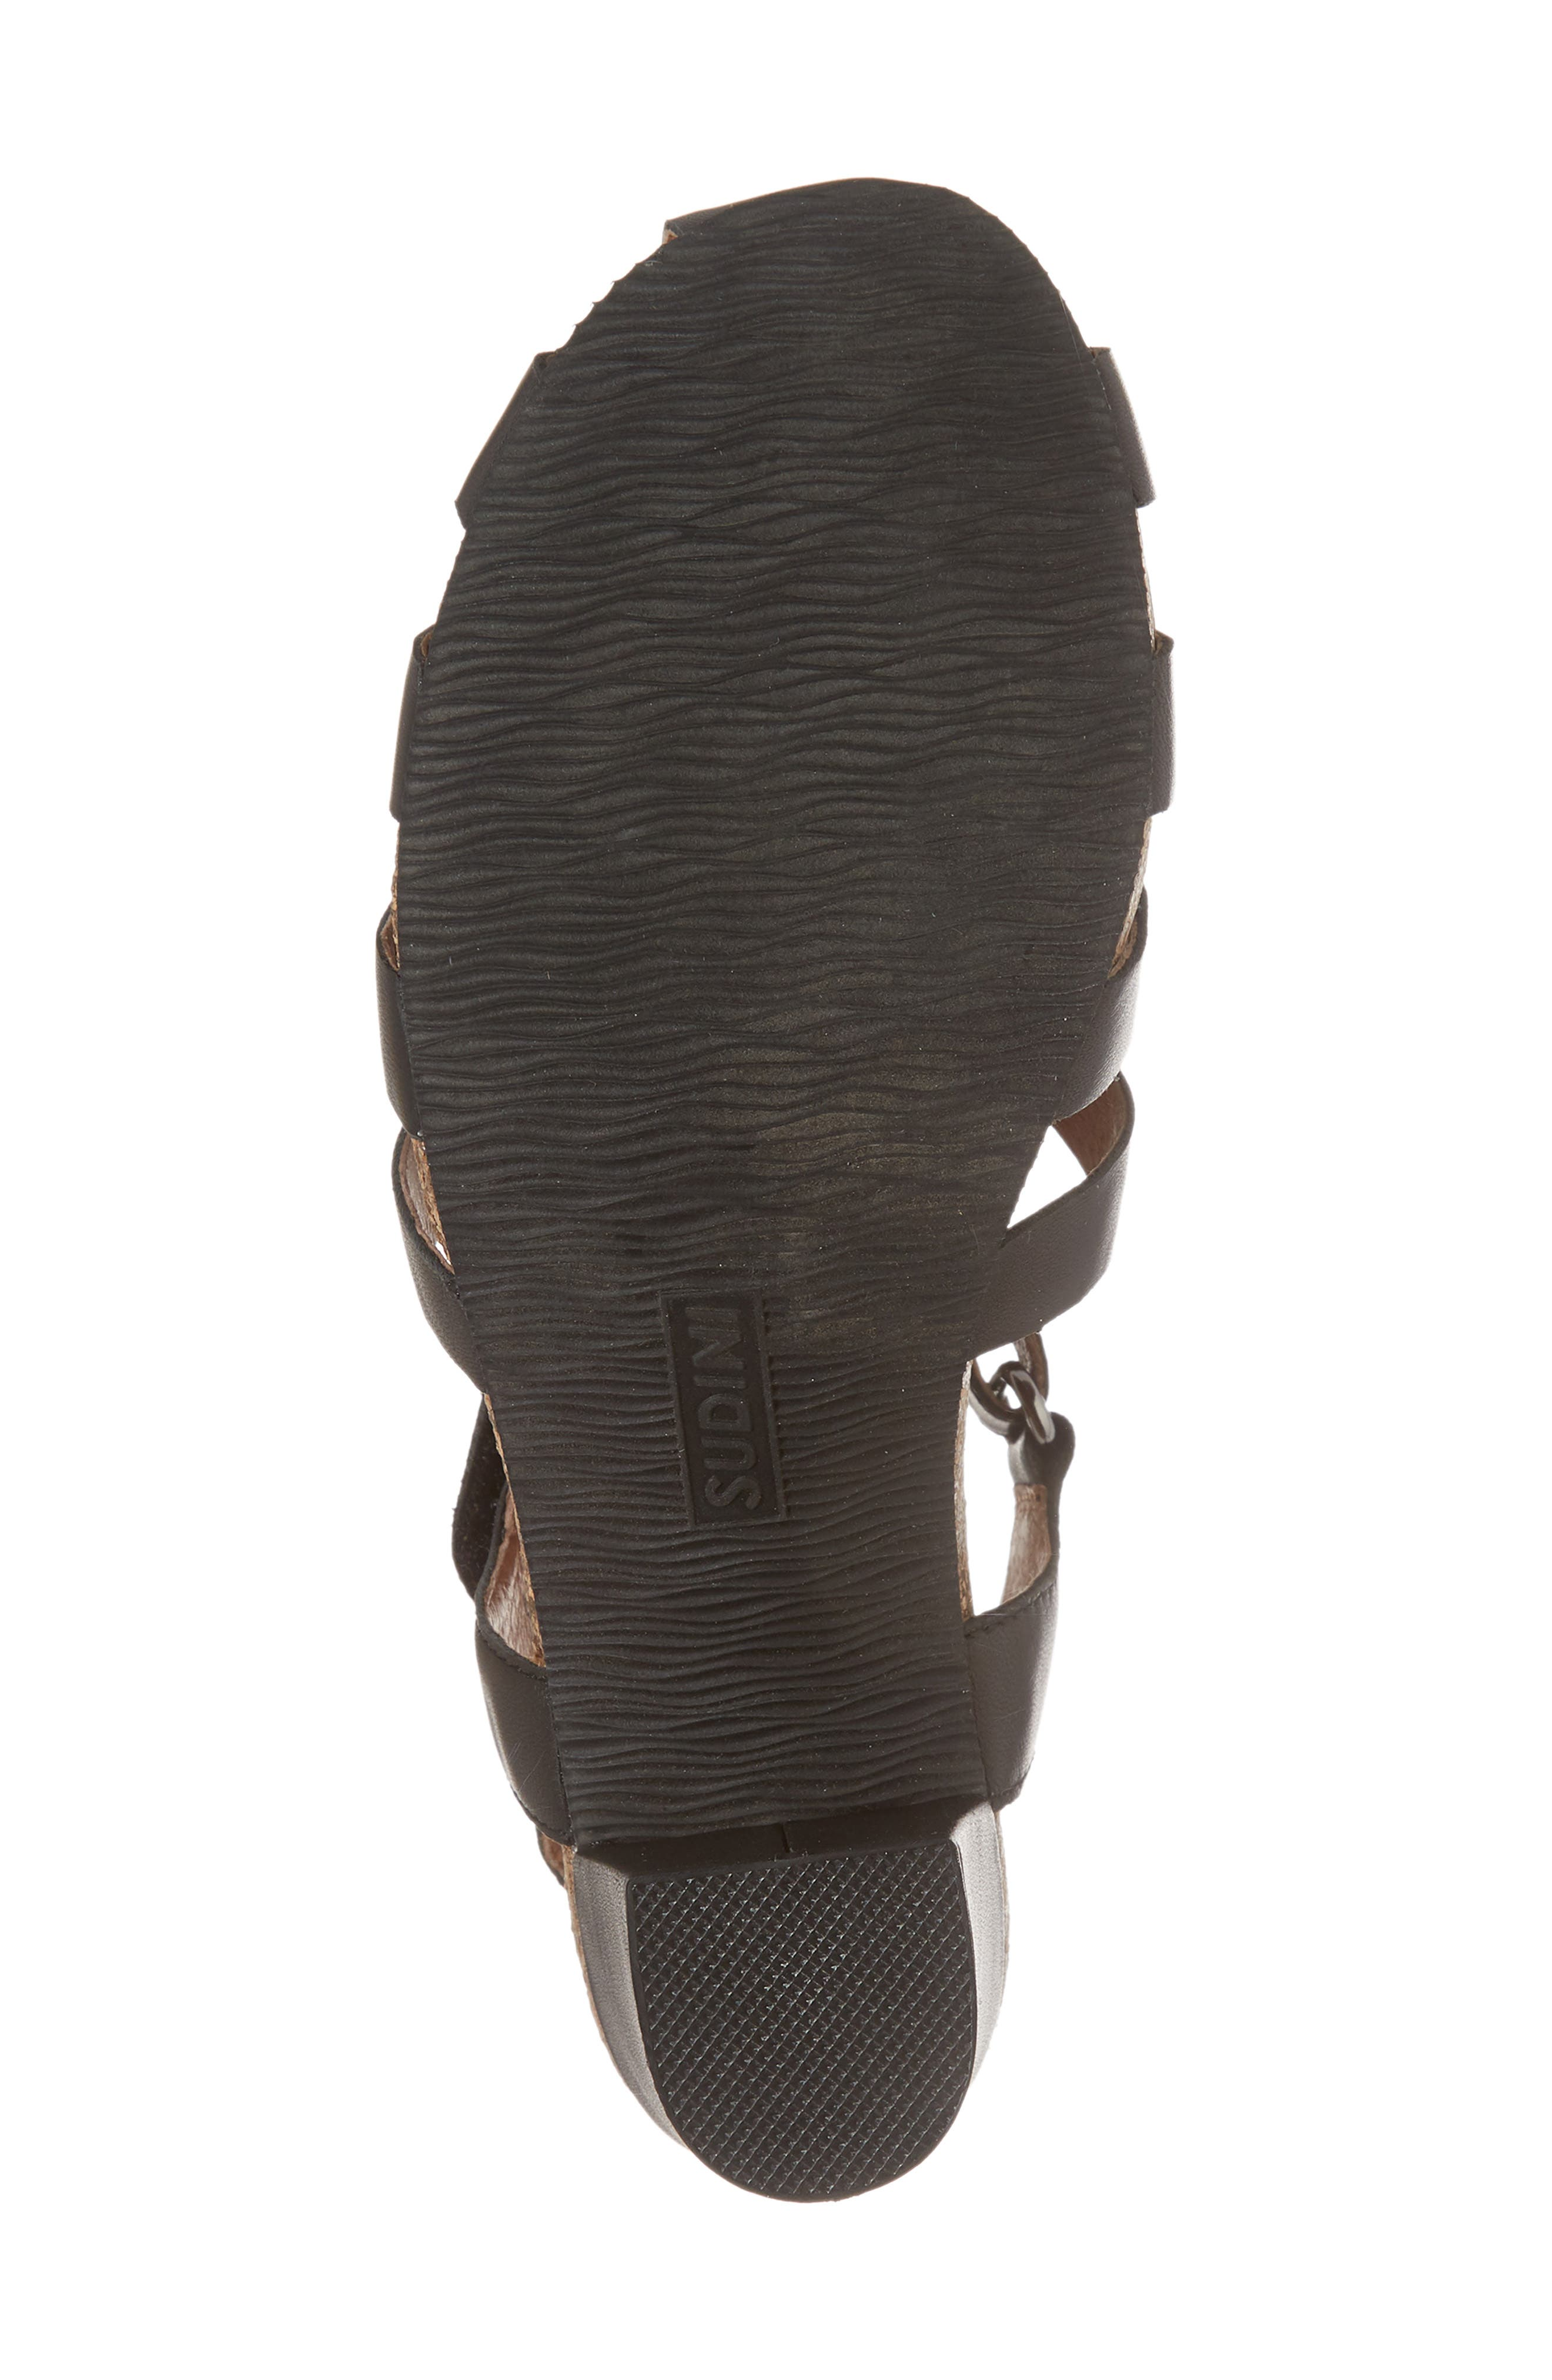 Carrara Block Heel Sandal,                             Alternate thumbnail 6, color,                             BLACK LEATHER